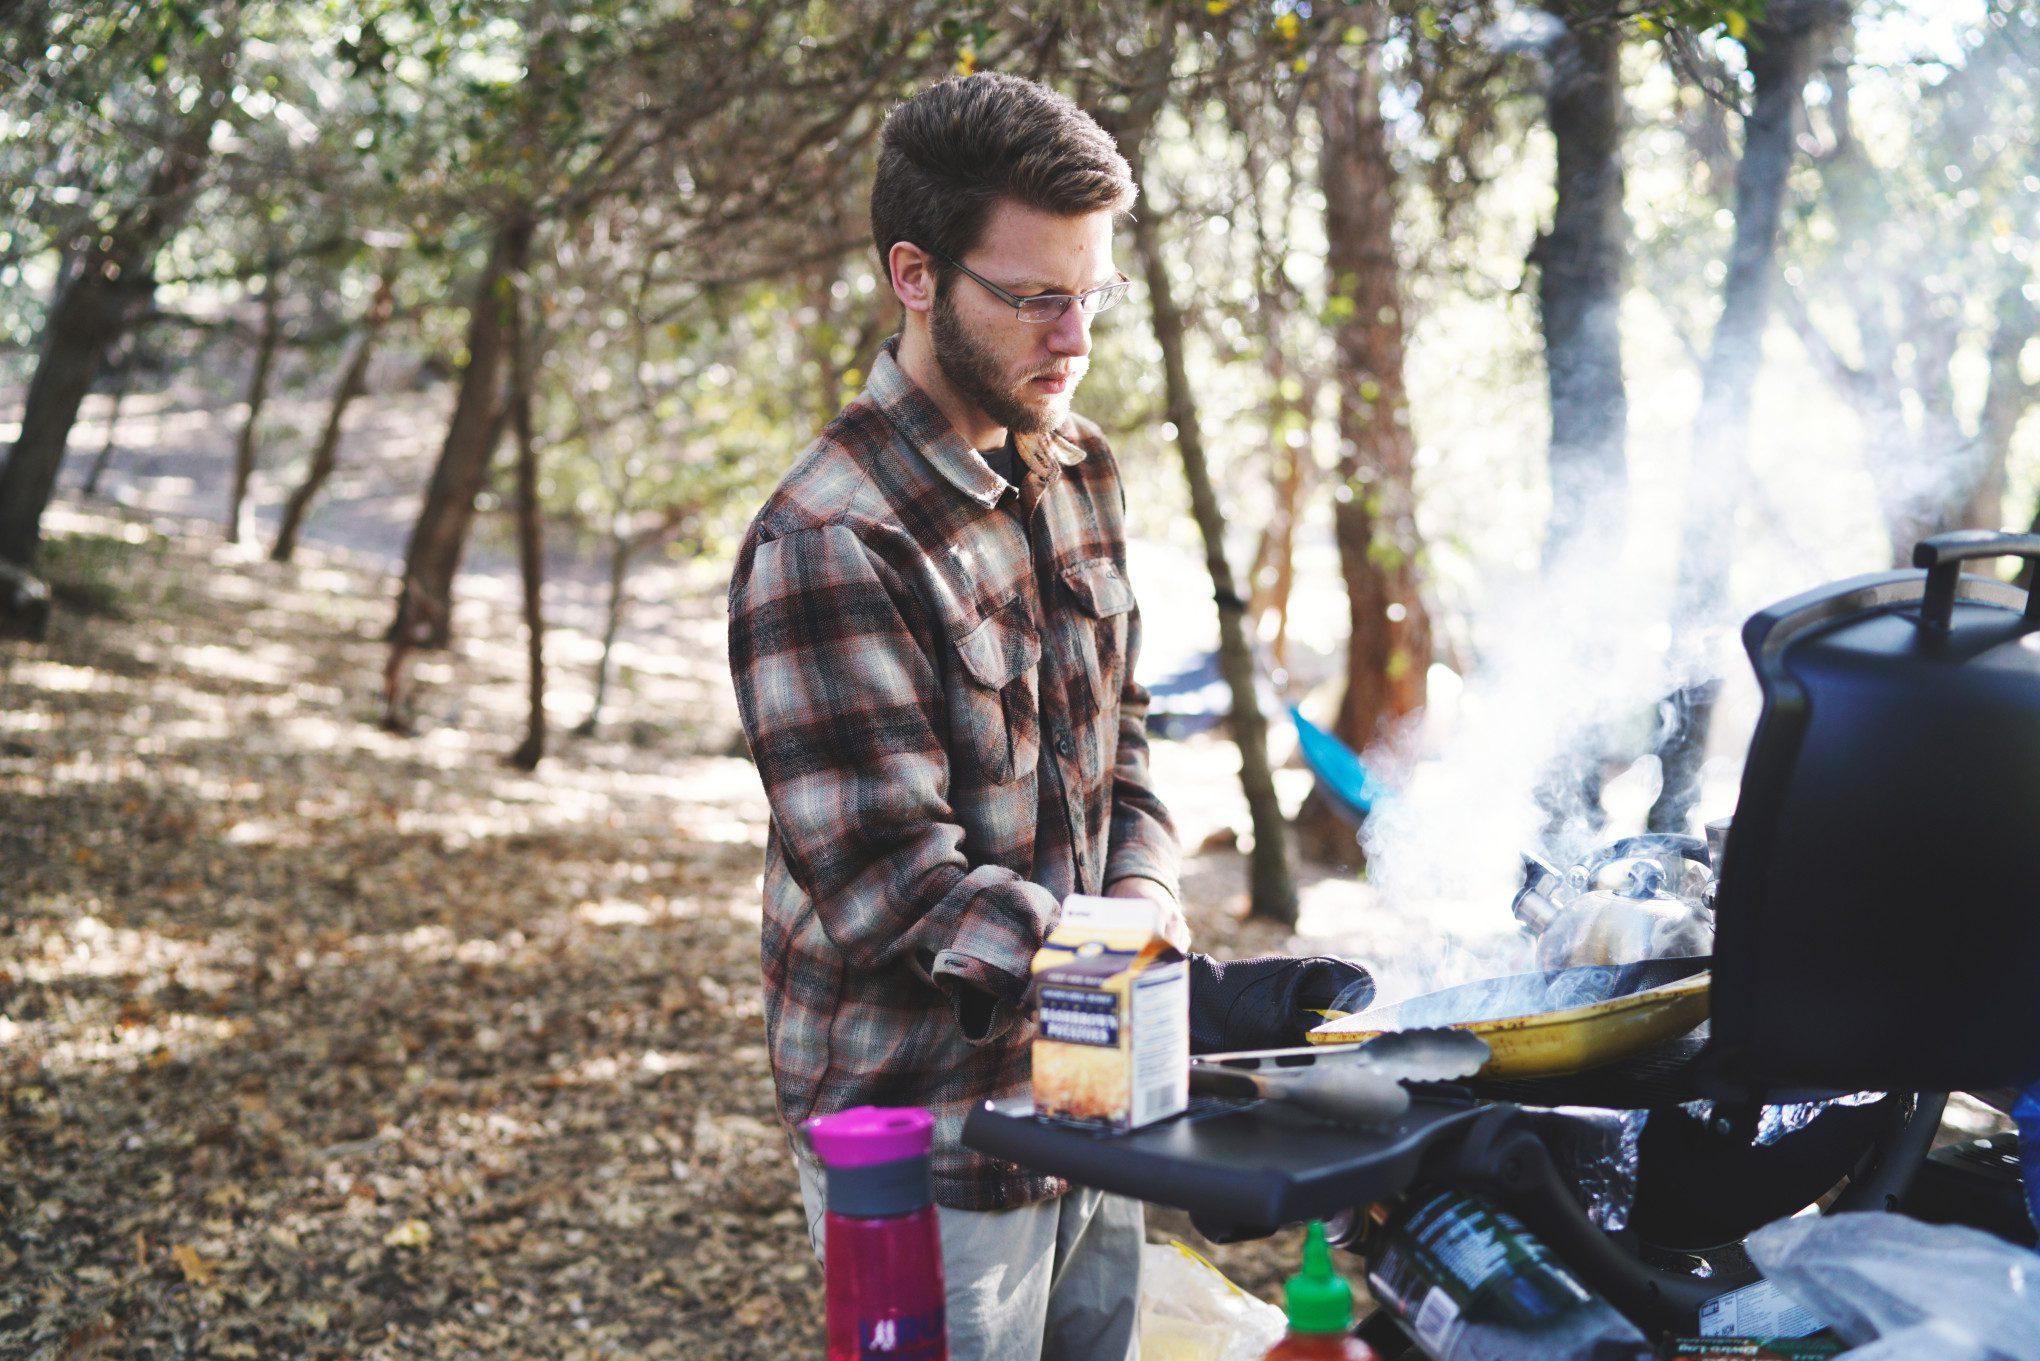 5 Easy Camping Meal Hacks